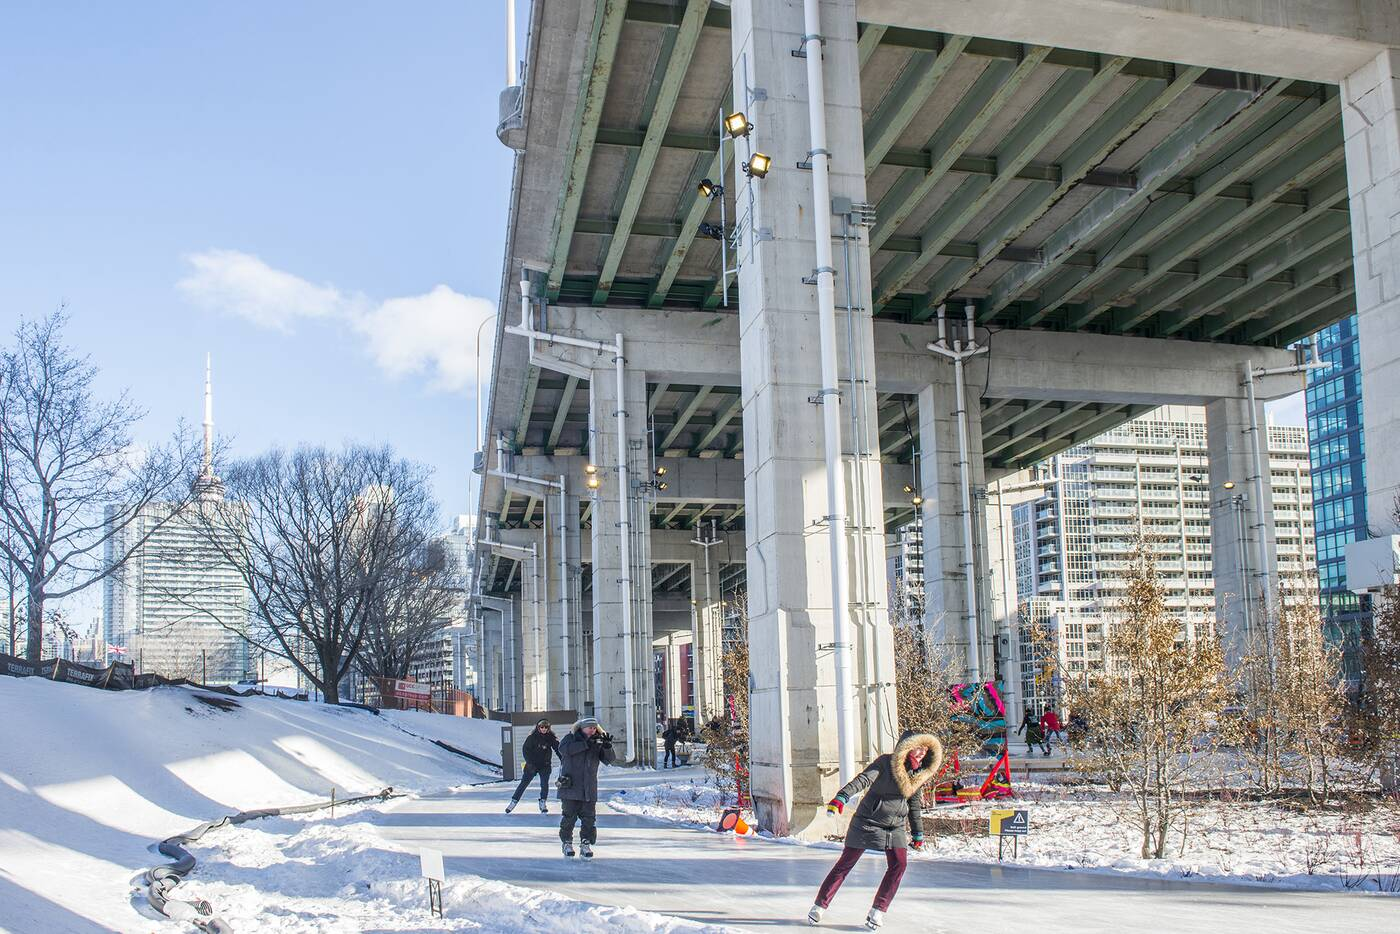 Bentway Skate Trail Toronto